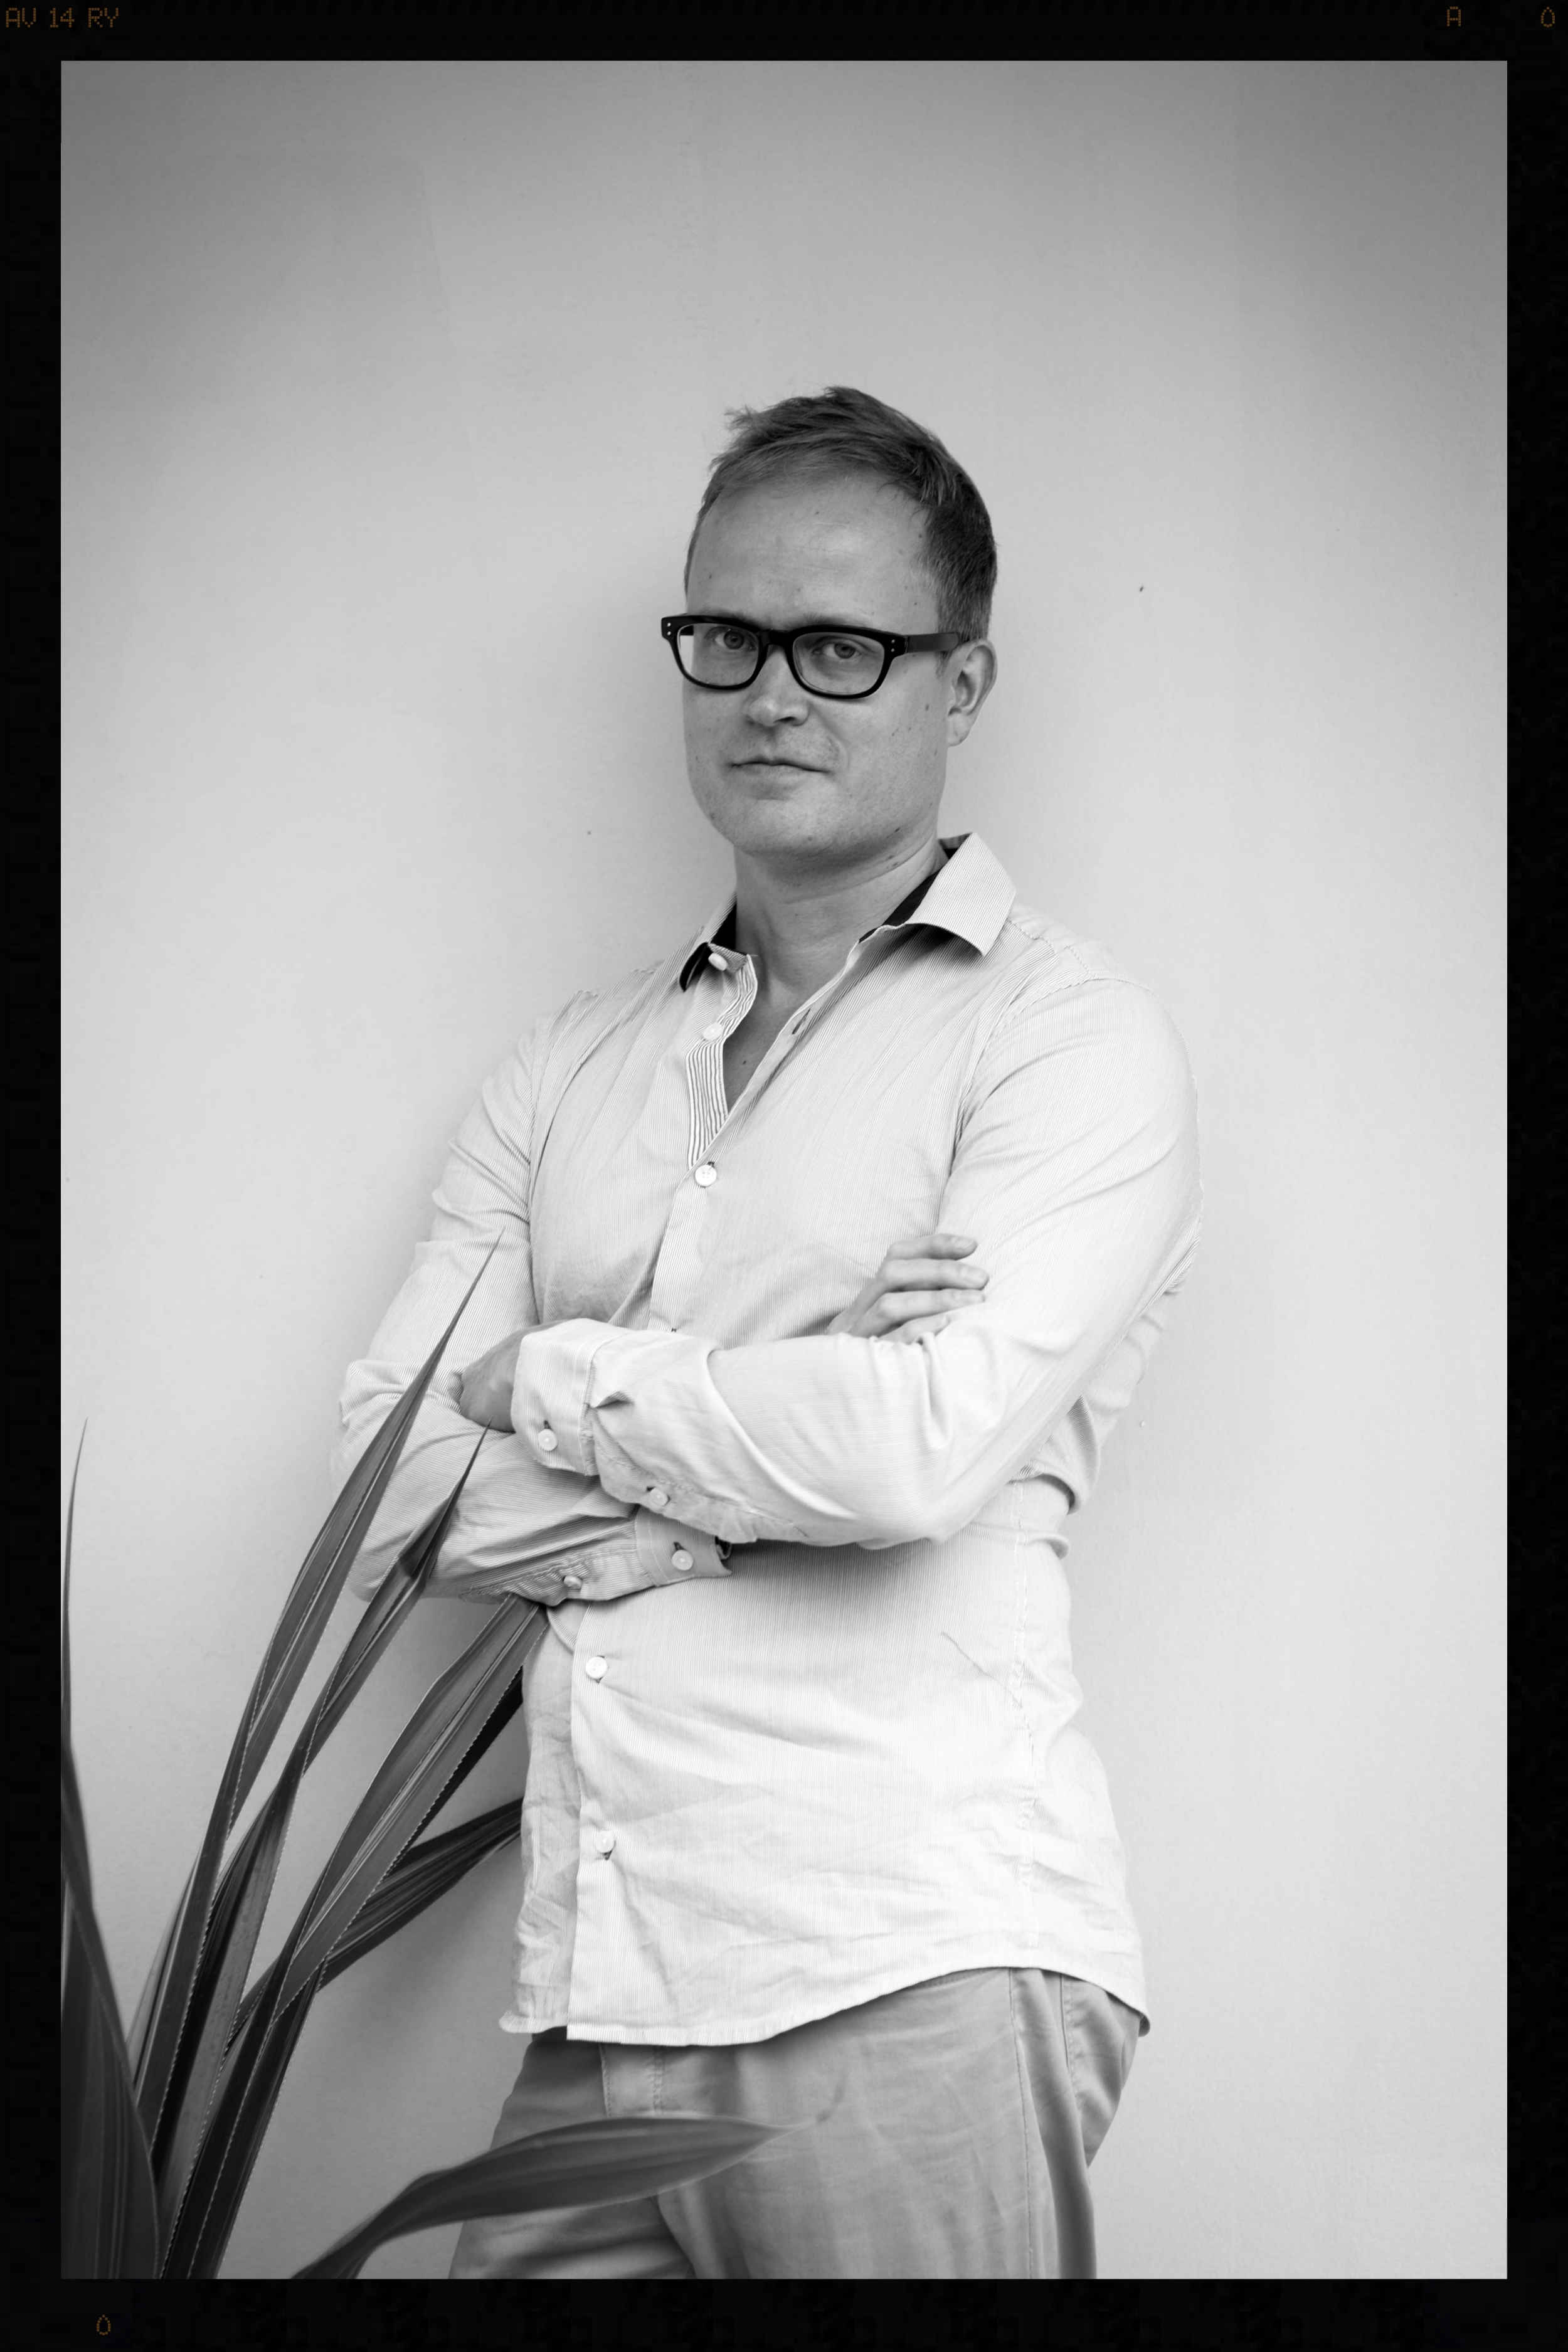 Photographer: Karoliina Ek